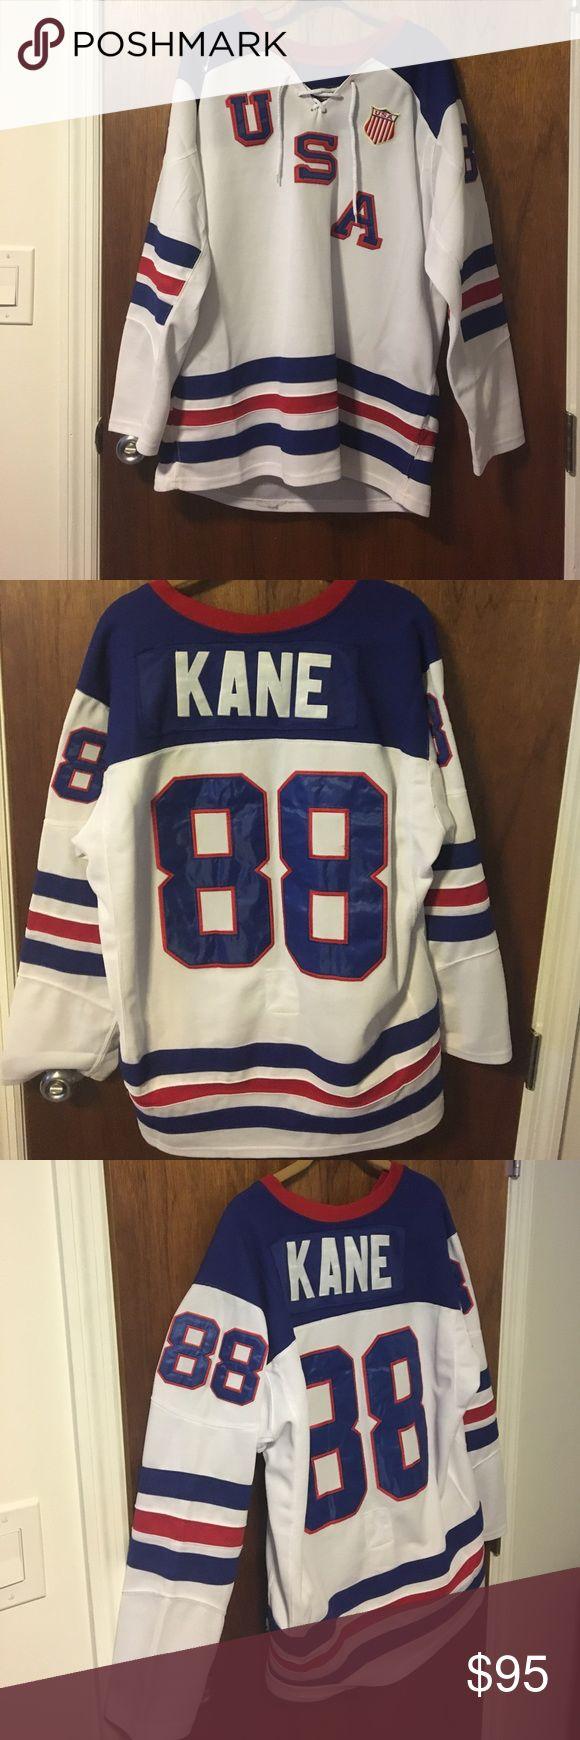 Patrick Kane team USA OLYMPIC HOCKEY JERSEY Patrick Kane team USA hockey jersey Nike Other